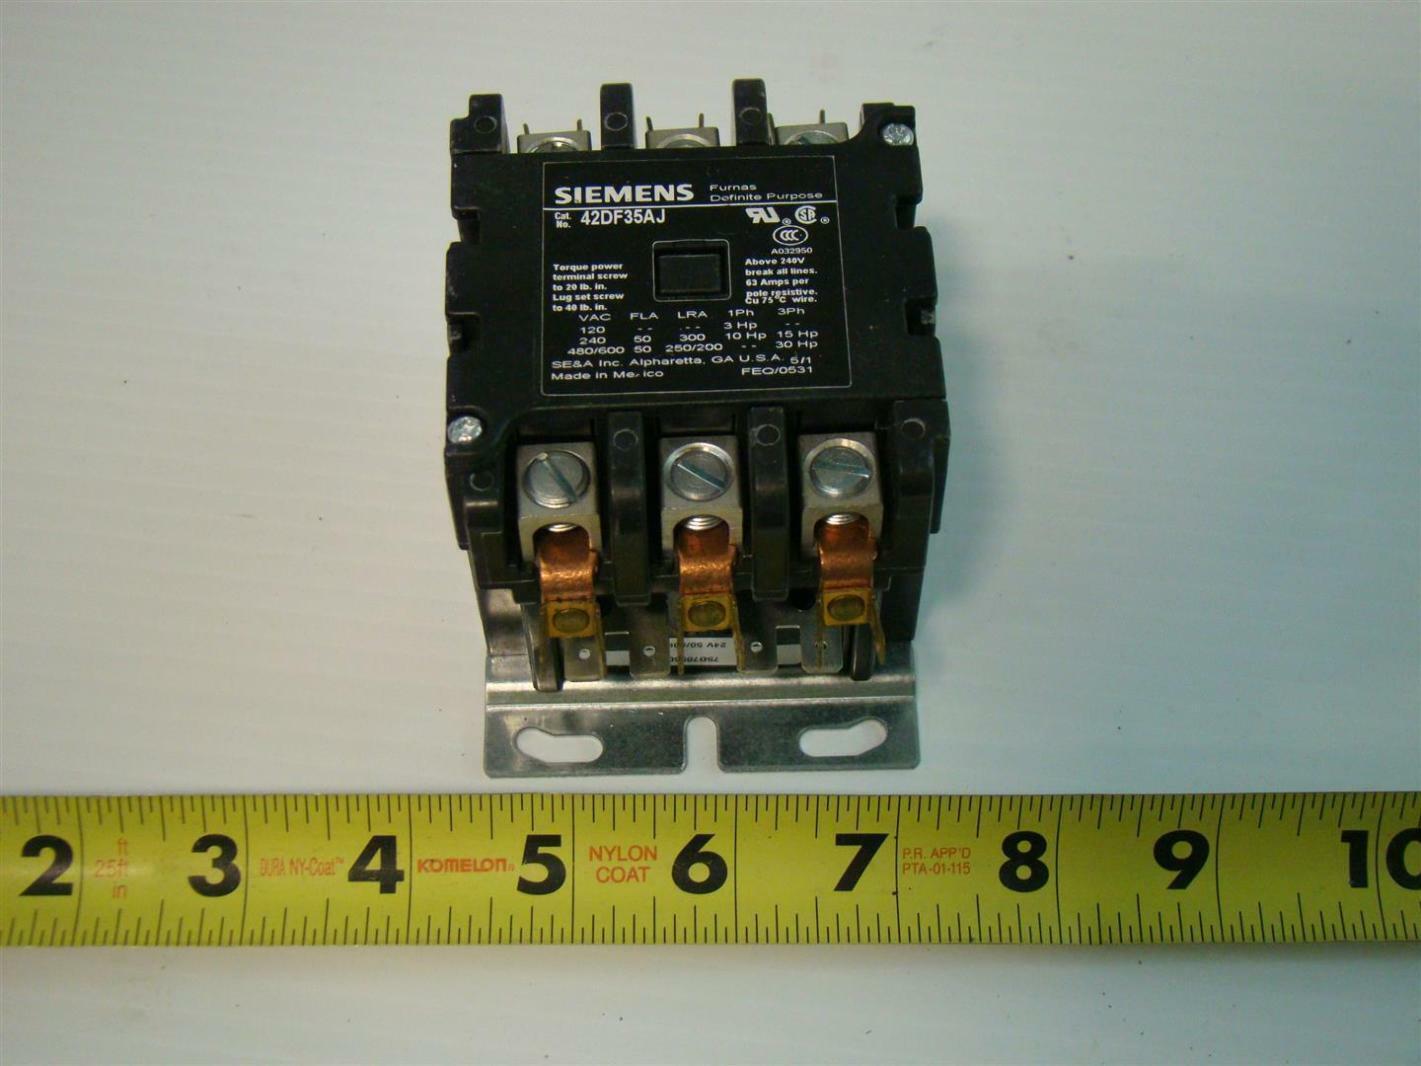 2 pole definite purpose contactor wiring diagram ezgo key switch siemens furnas 42df35aj 50a 3